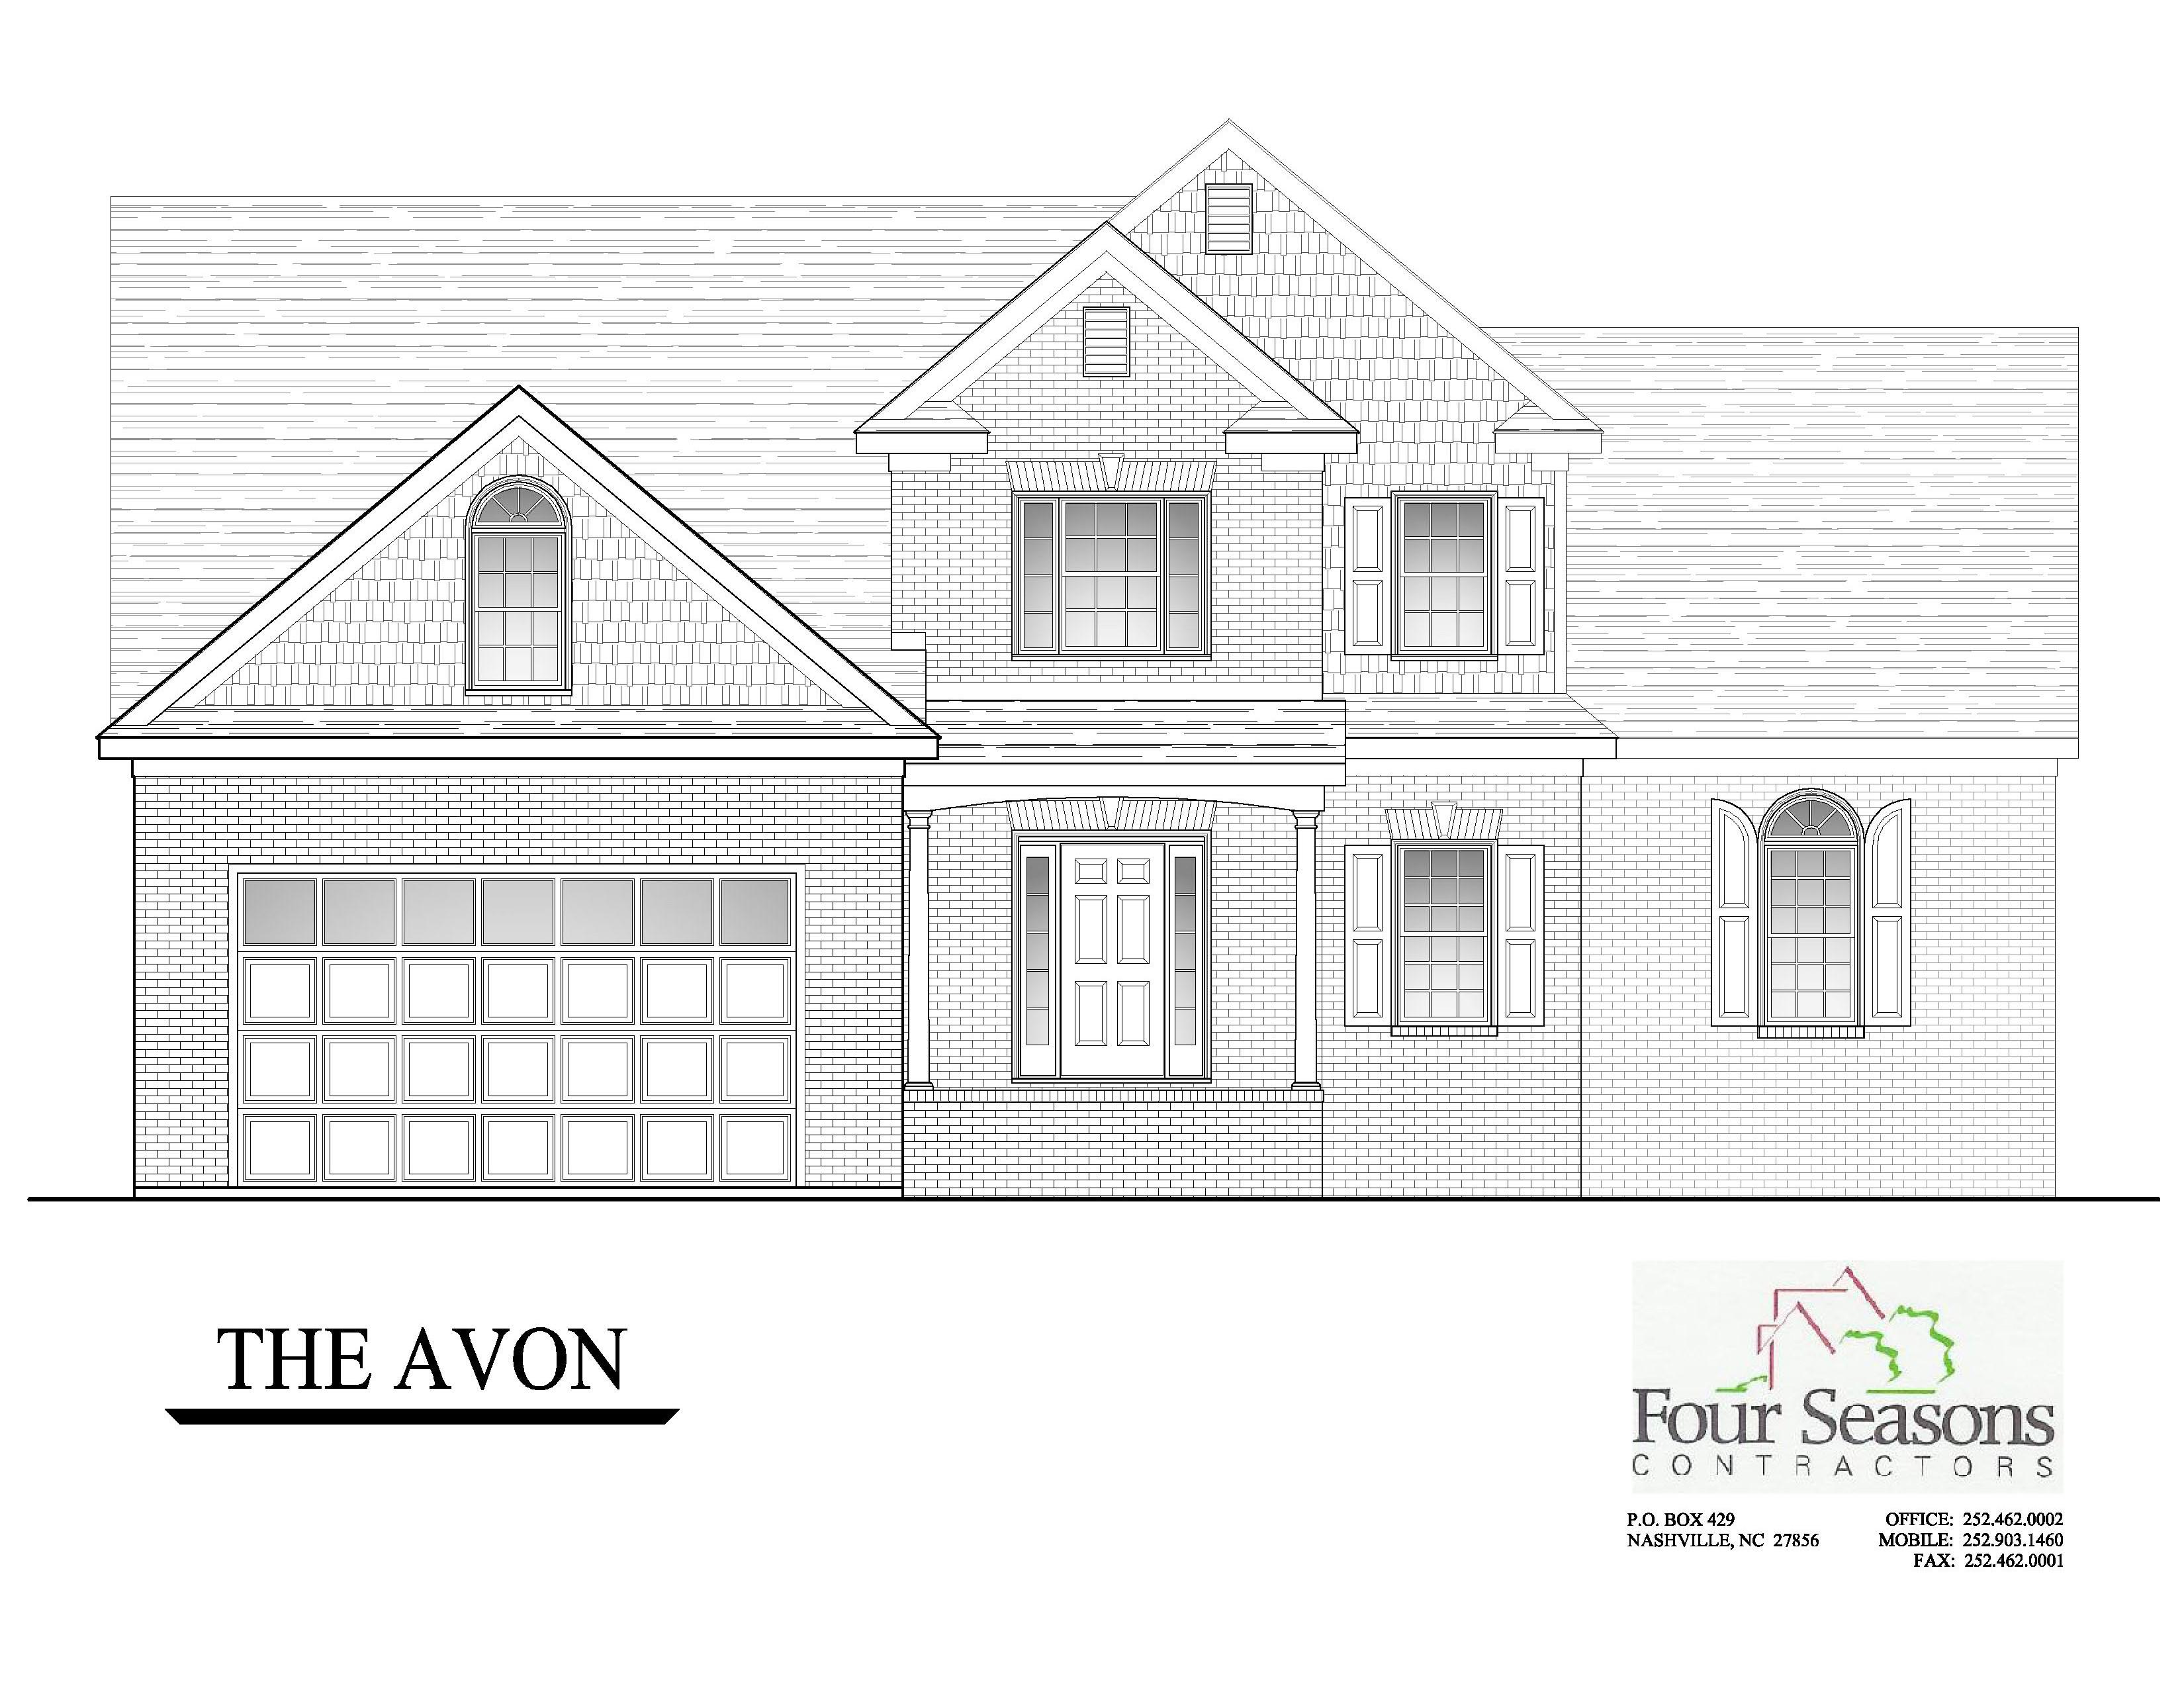 Avon Front Elevation four seasons contractors homes for sale new construction,New Home Construction Floor Plans